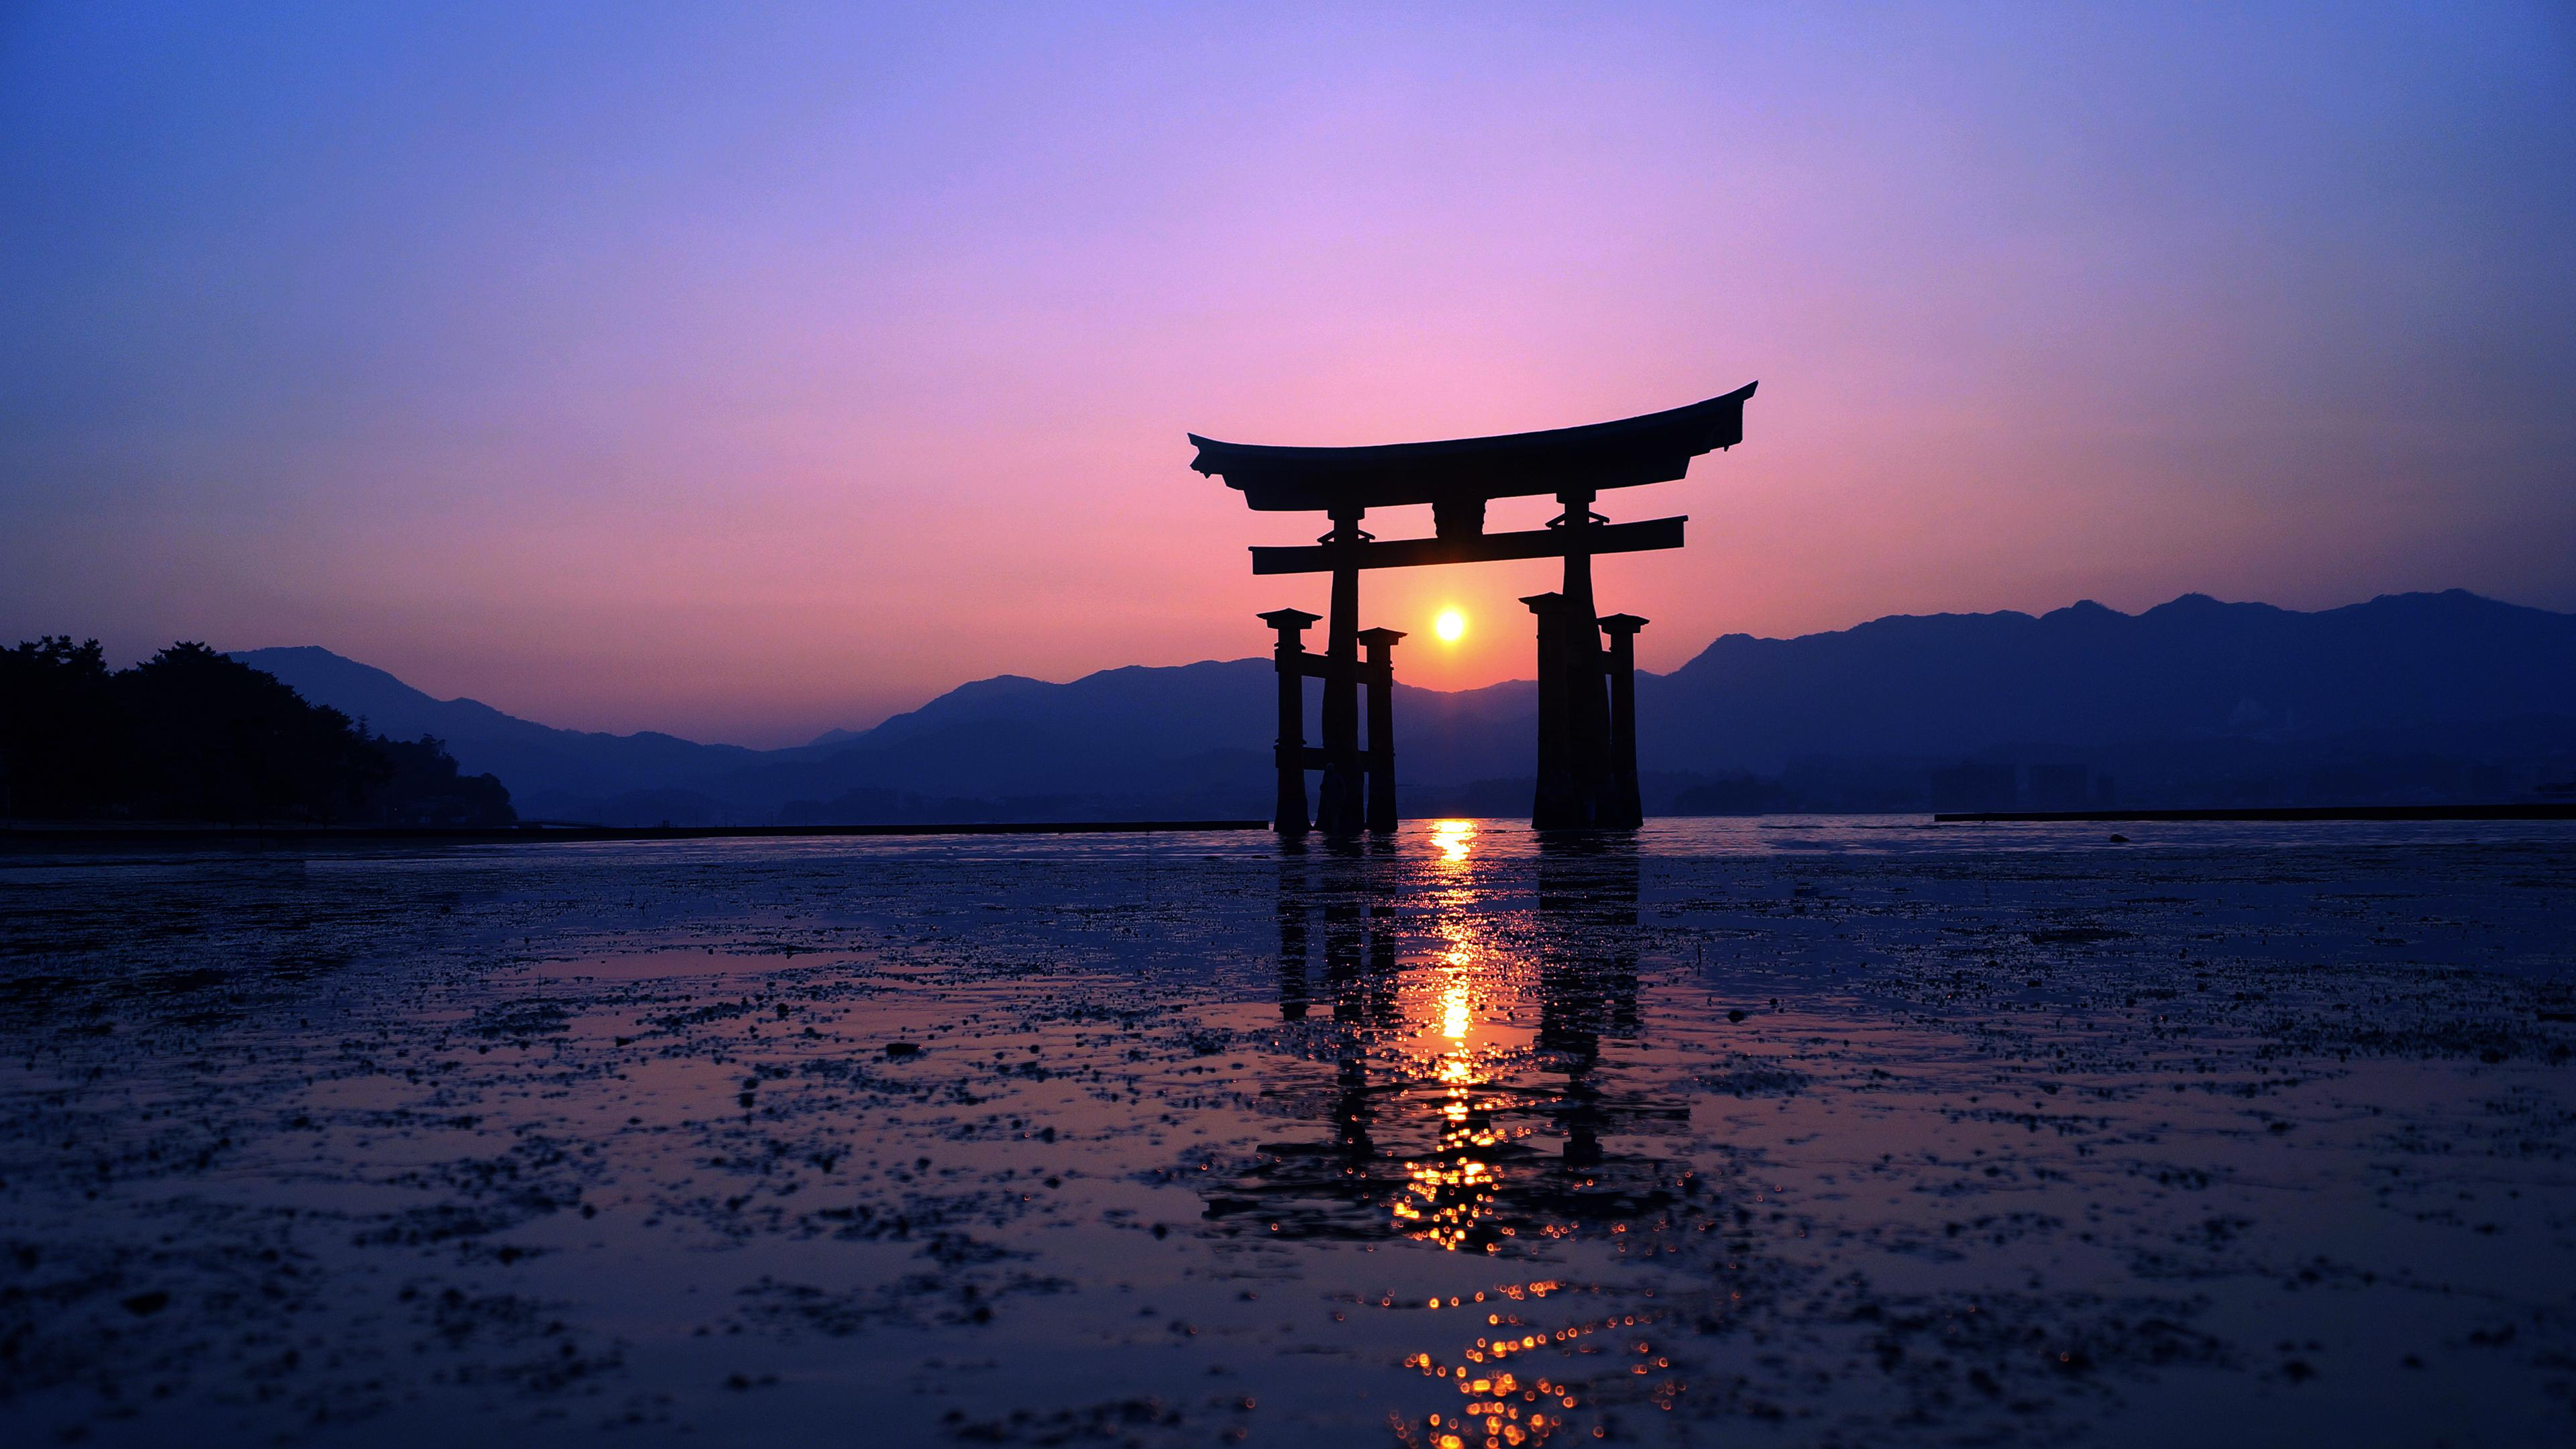 Miyajima Gate 3840x2160 wallpaper 3840x2160